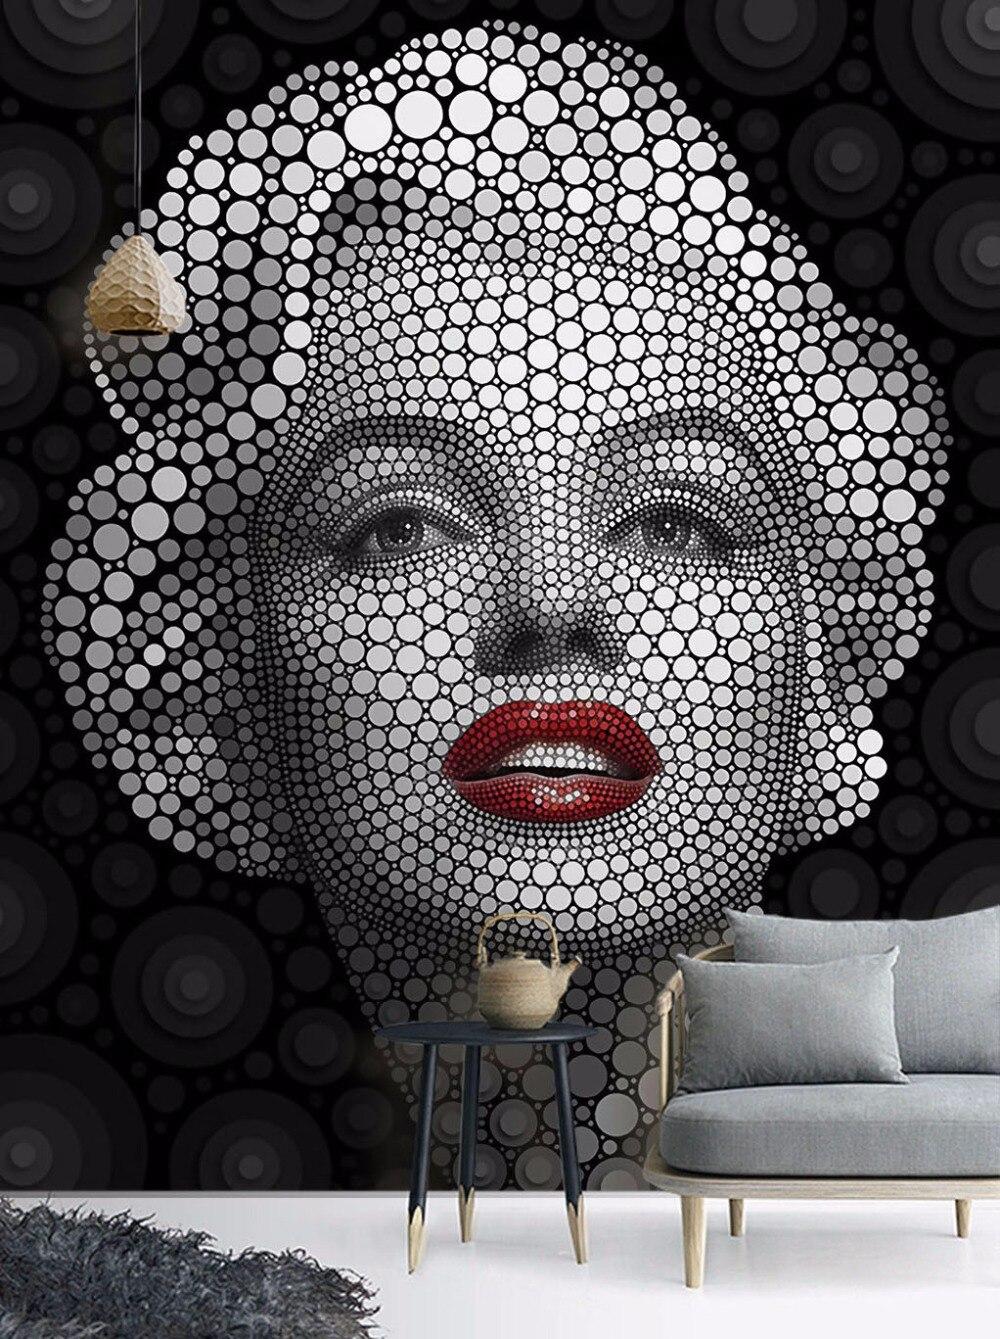 Pintura Mural creativa 5D/8D Marilyn Monroe en blanco y negro para sala de estar, papel tapiz 3d, murales 3d, Mural de pared